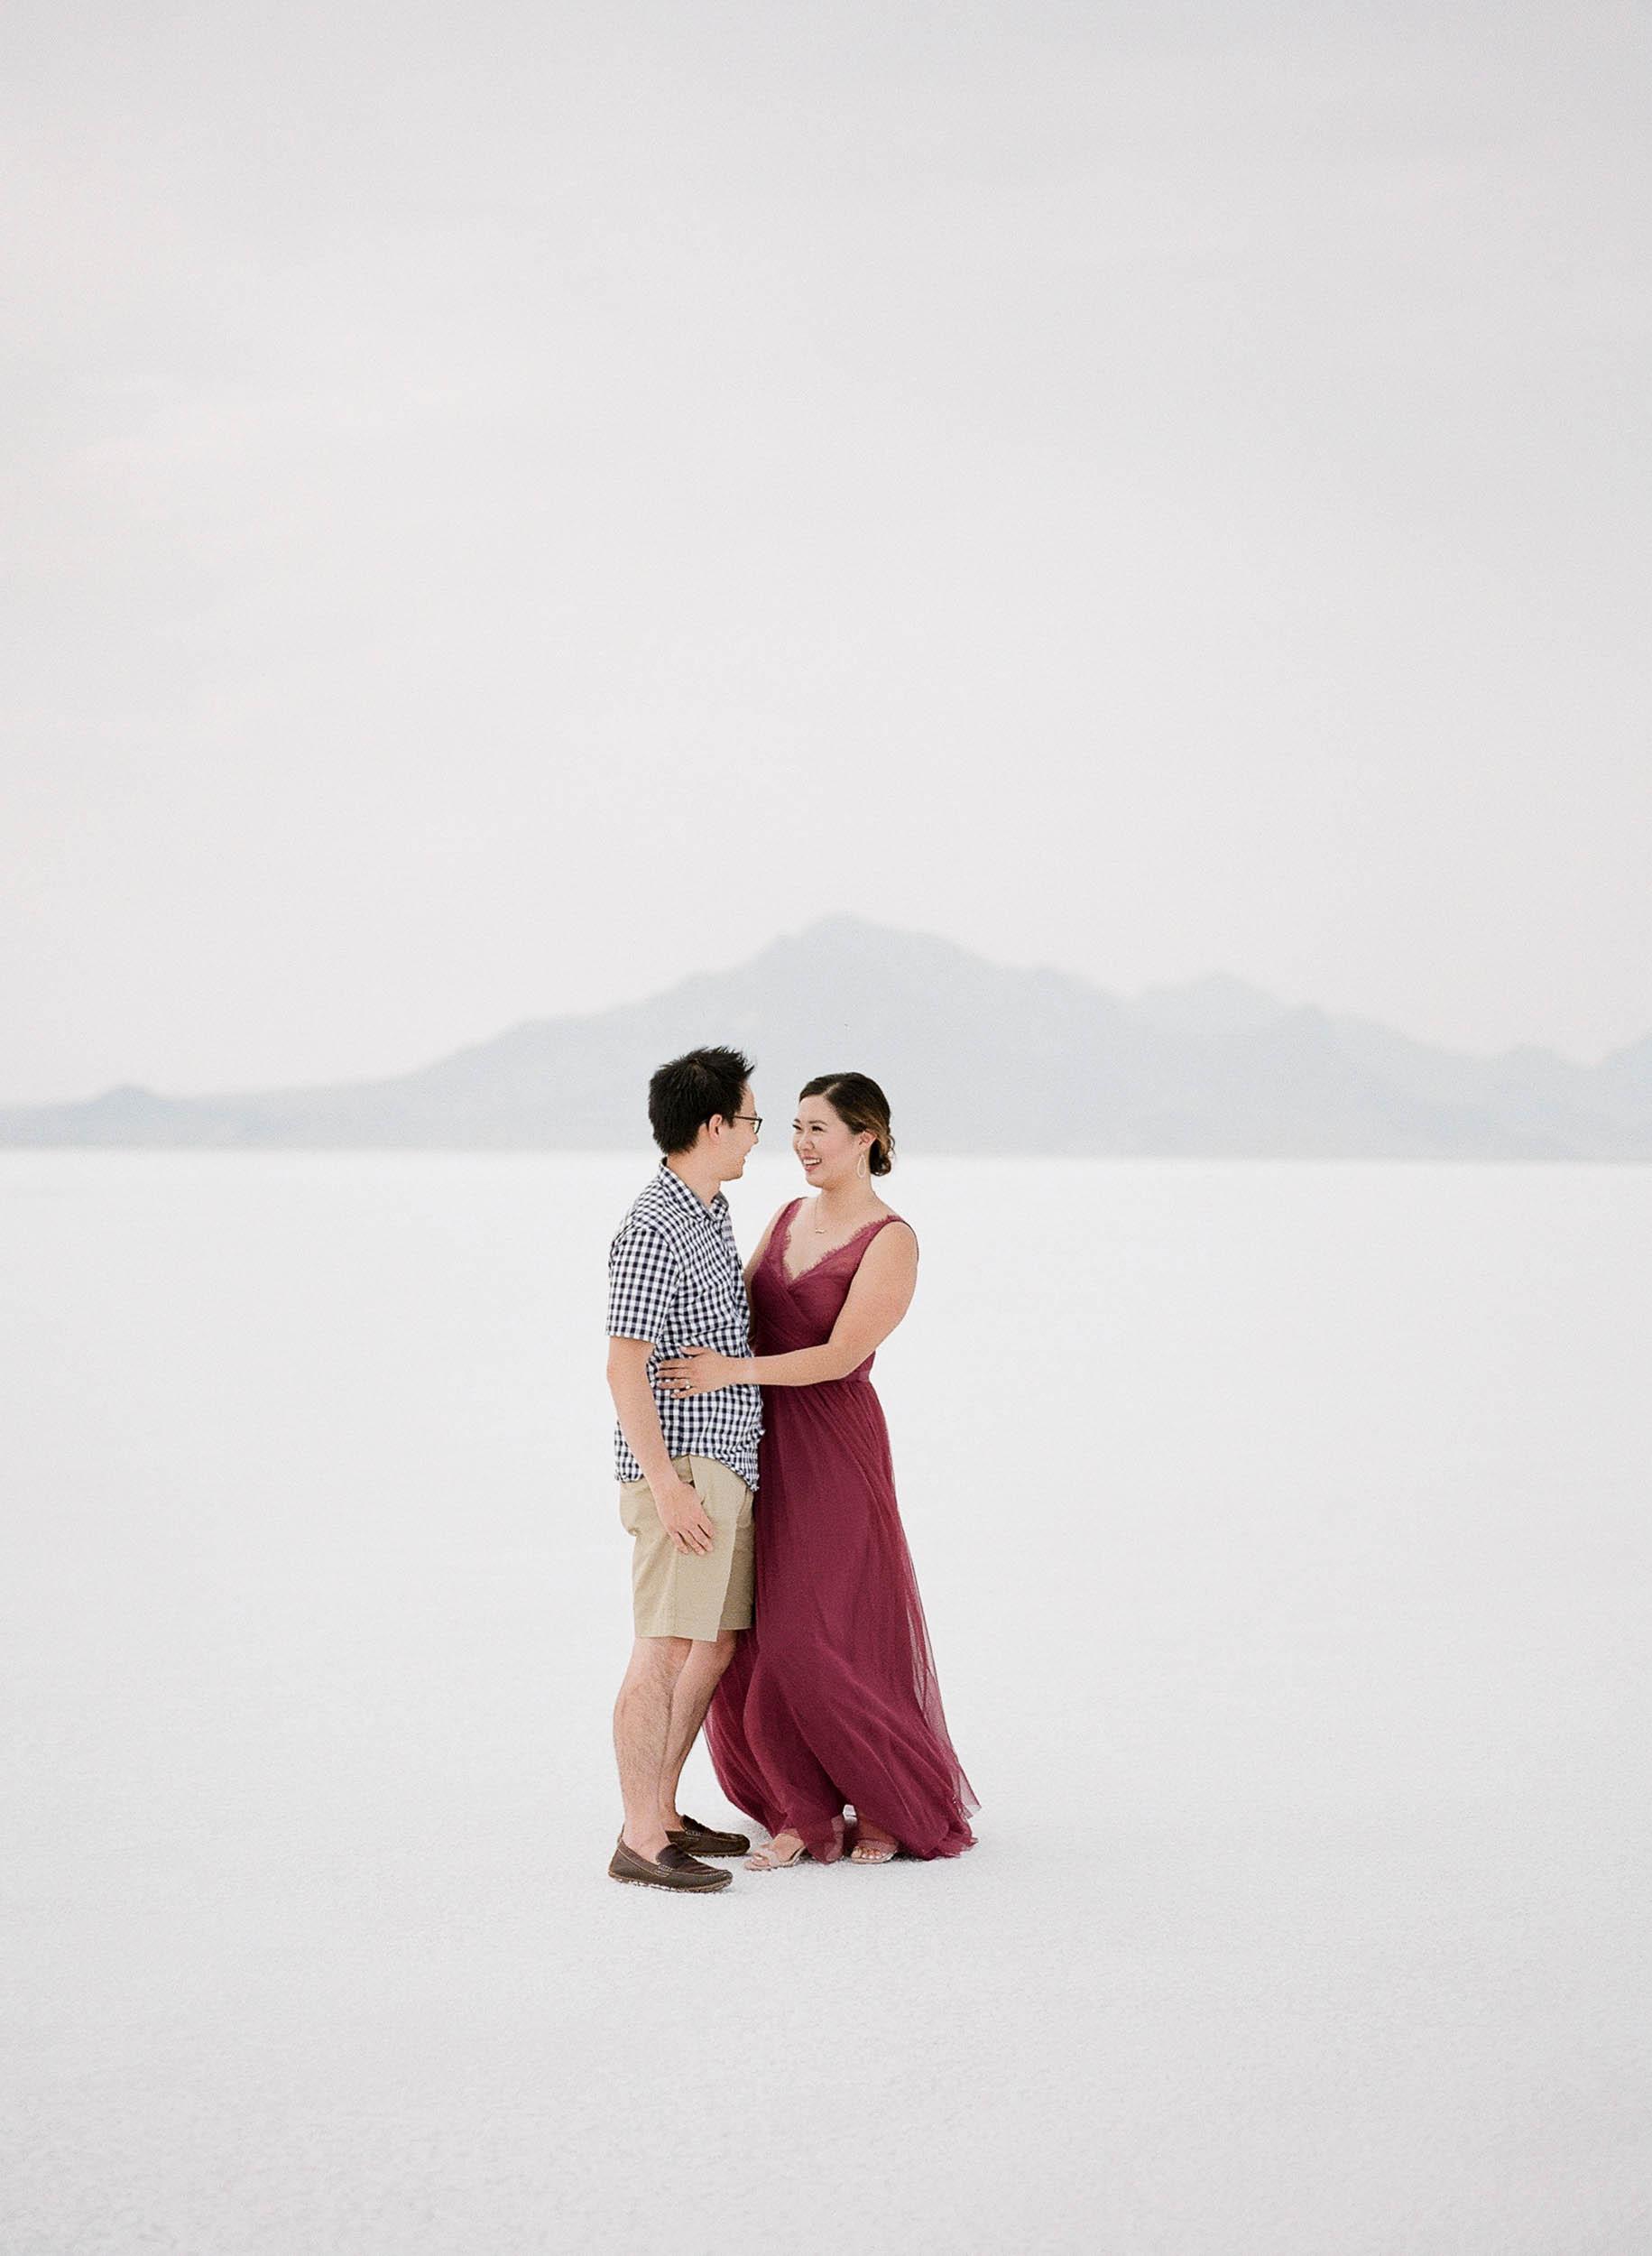 070918_Sandy A La Mode_Family_Utah Salt Flats_Buena Lane Photography_F400_04.jpg